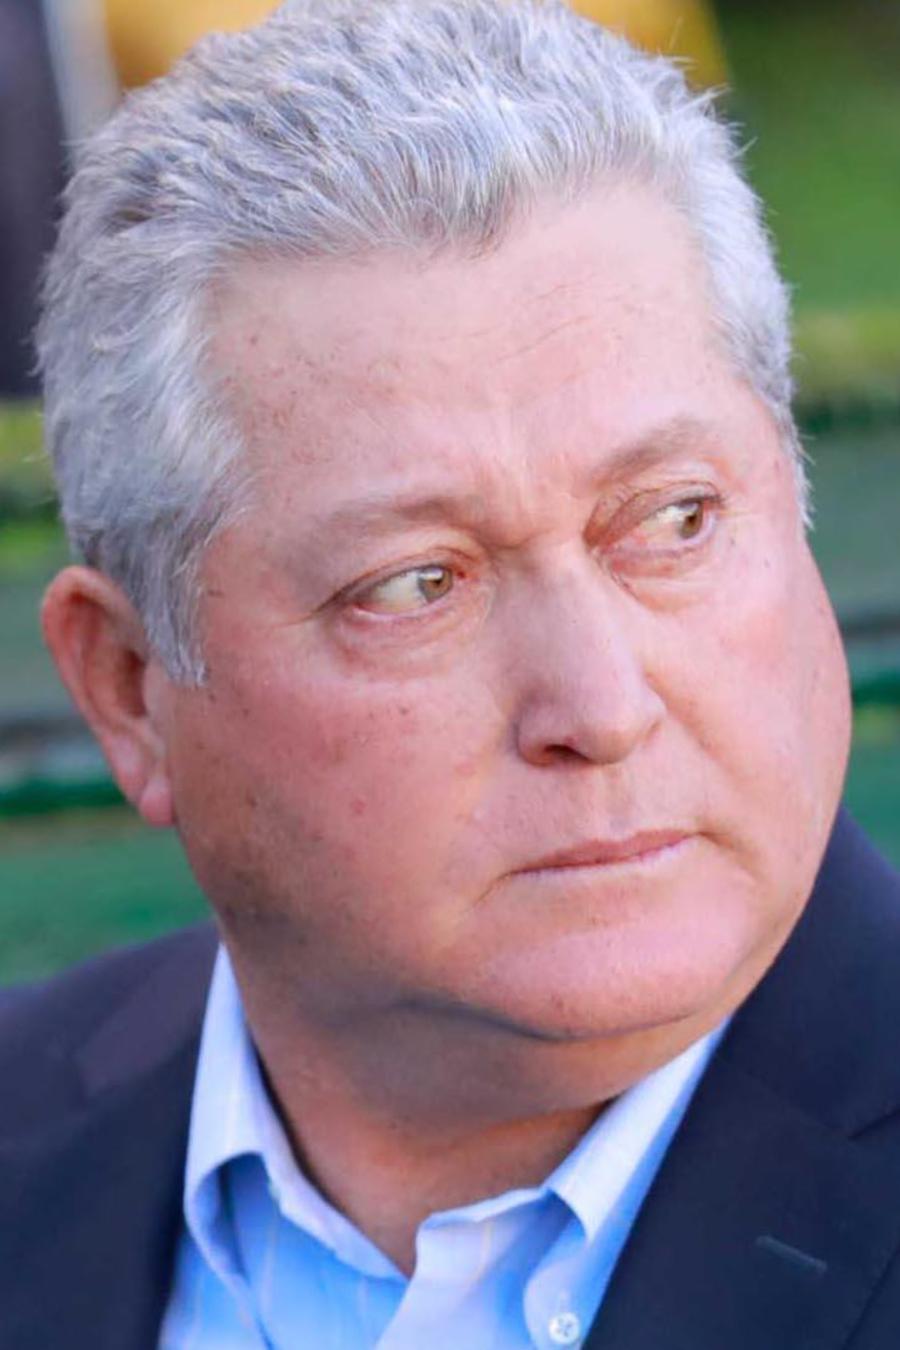 Victor Manuel Vucetich